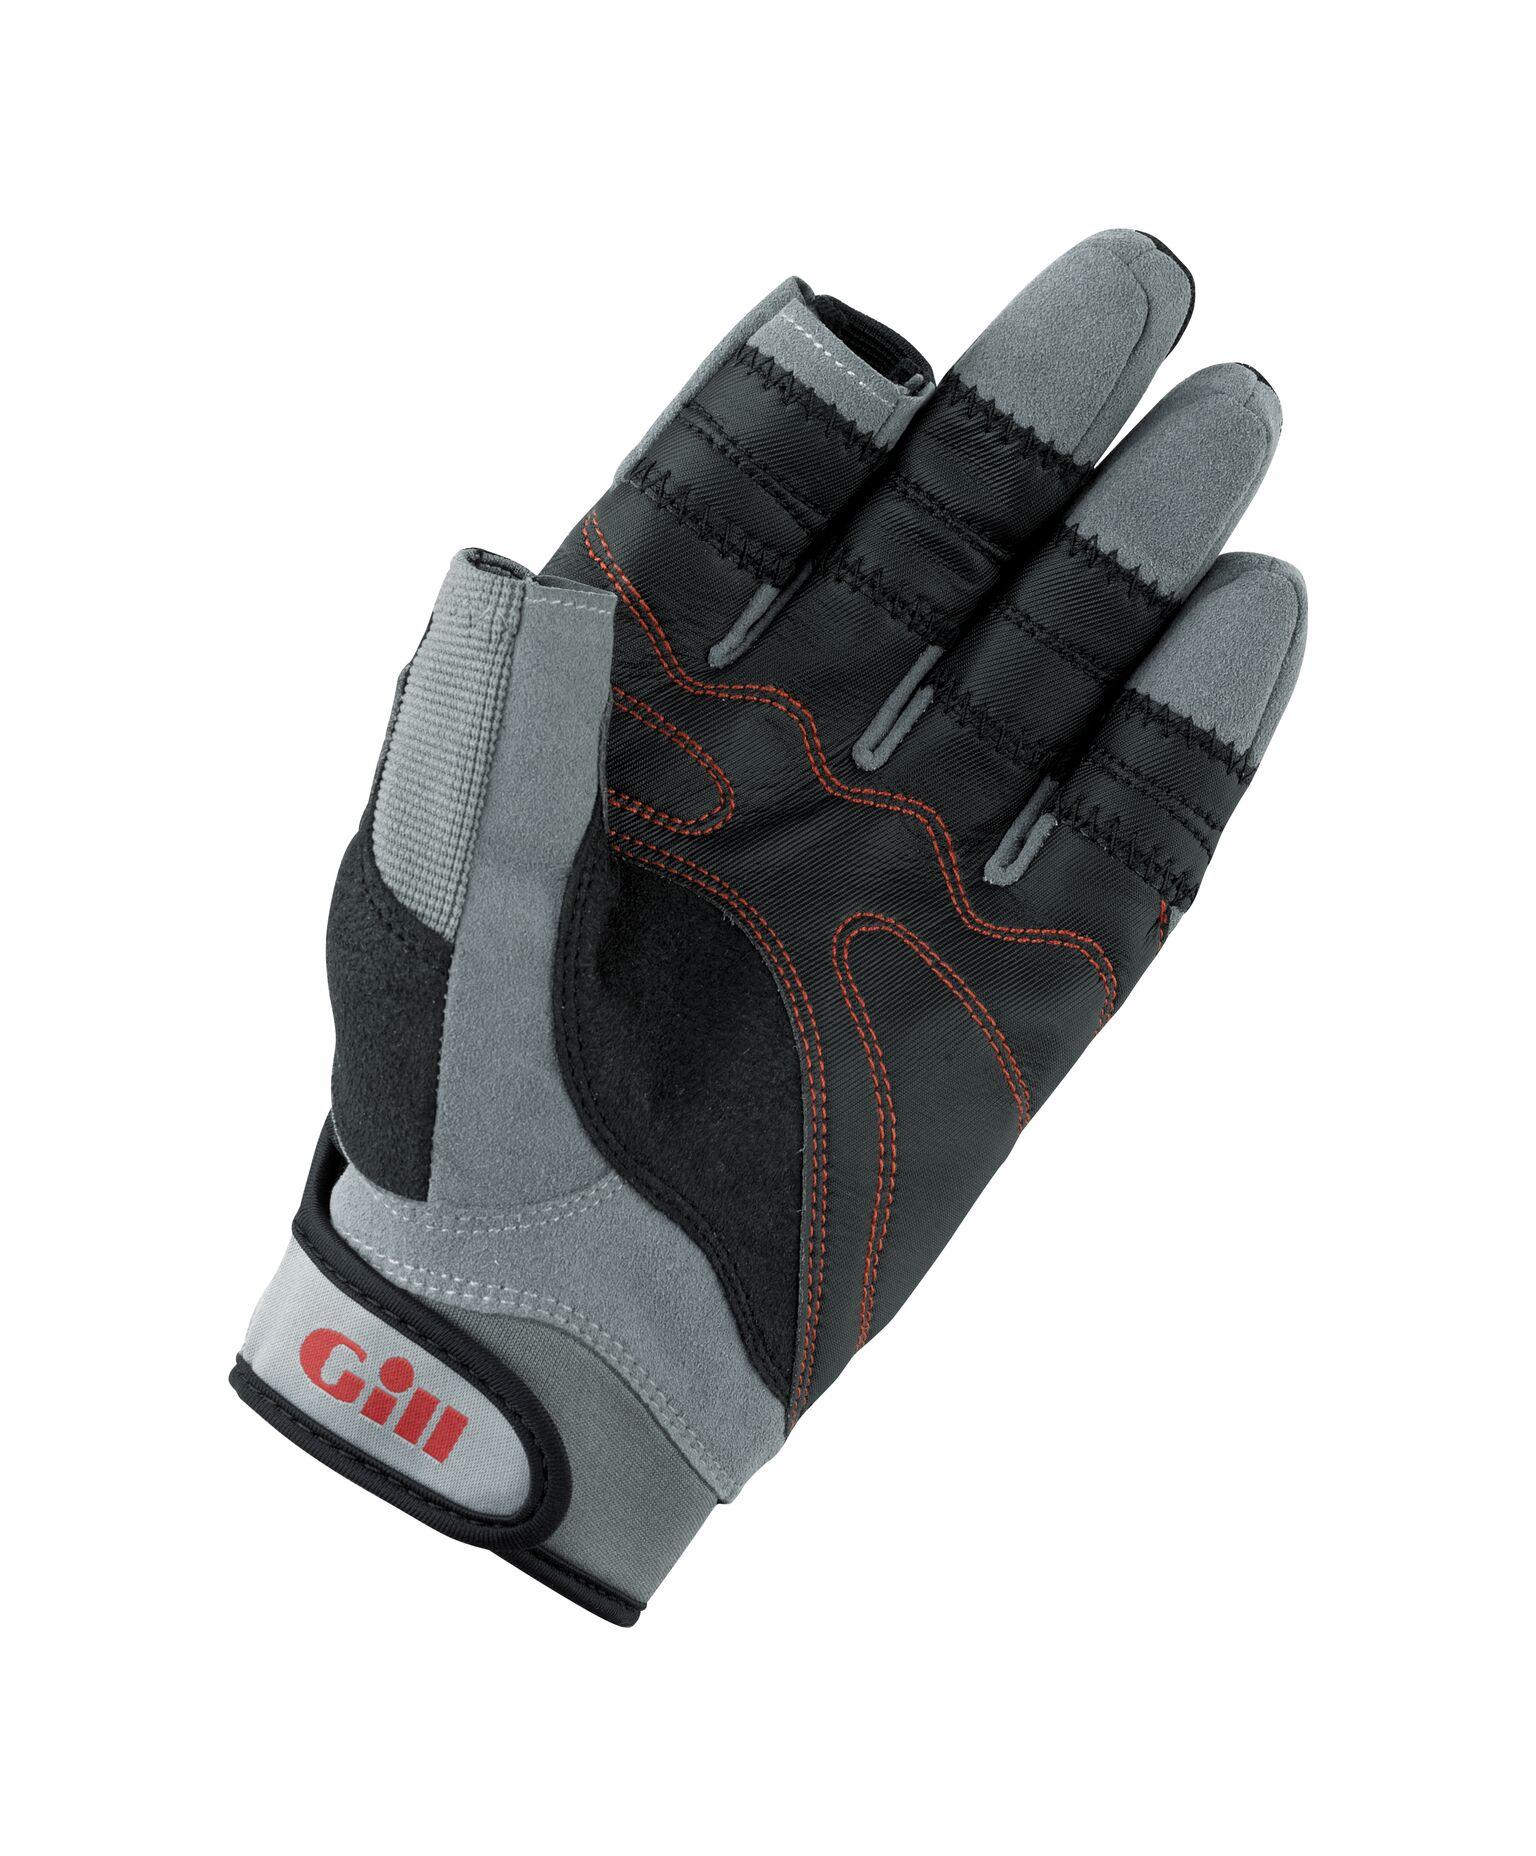 Gill Championship Glove - Long Finger